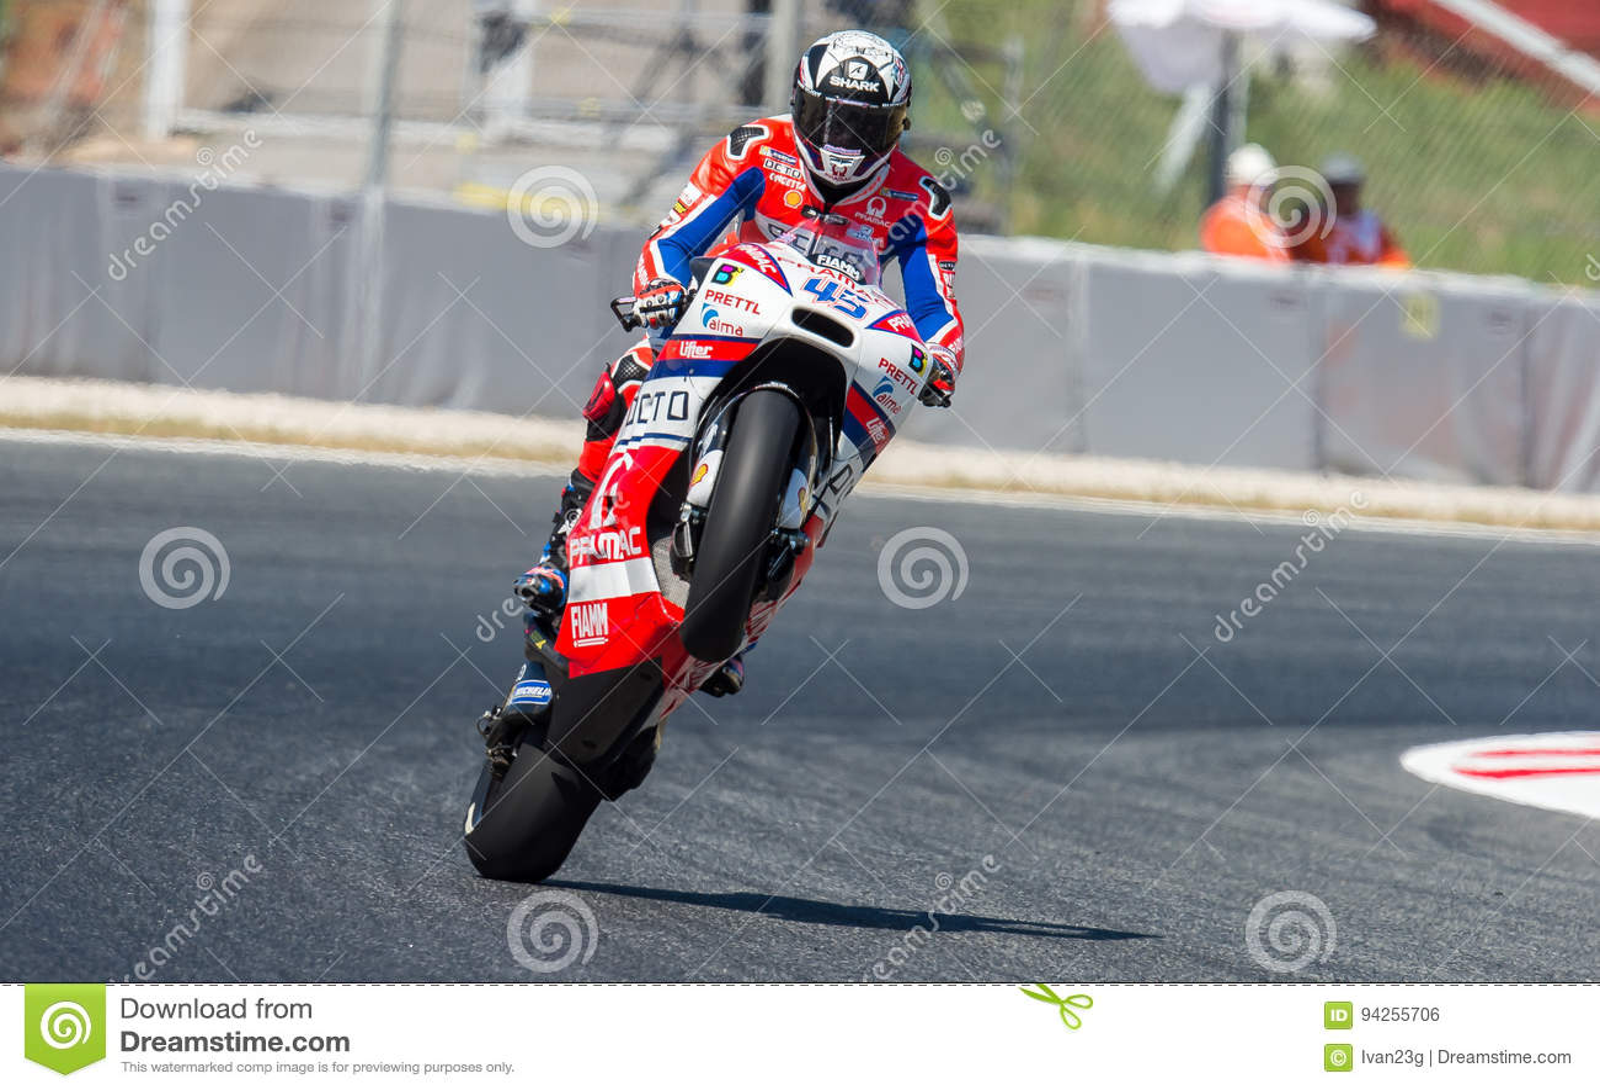 Gp Catalunya Motogp Skott Redding Gonki Komandy Octo Pramac